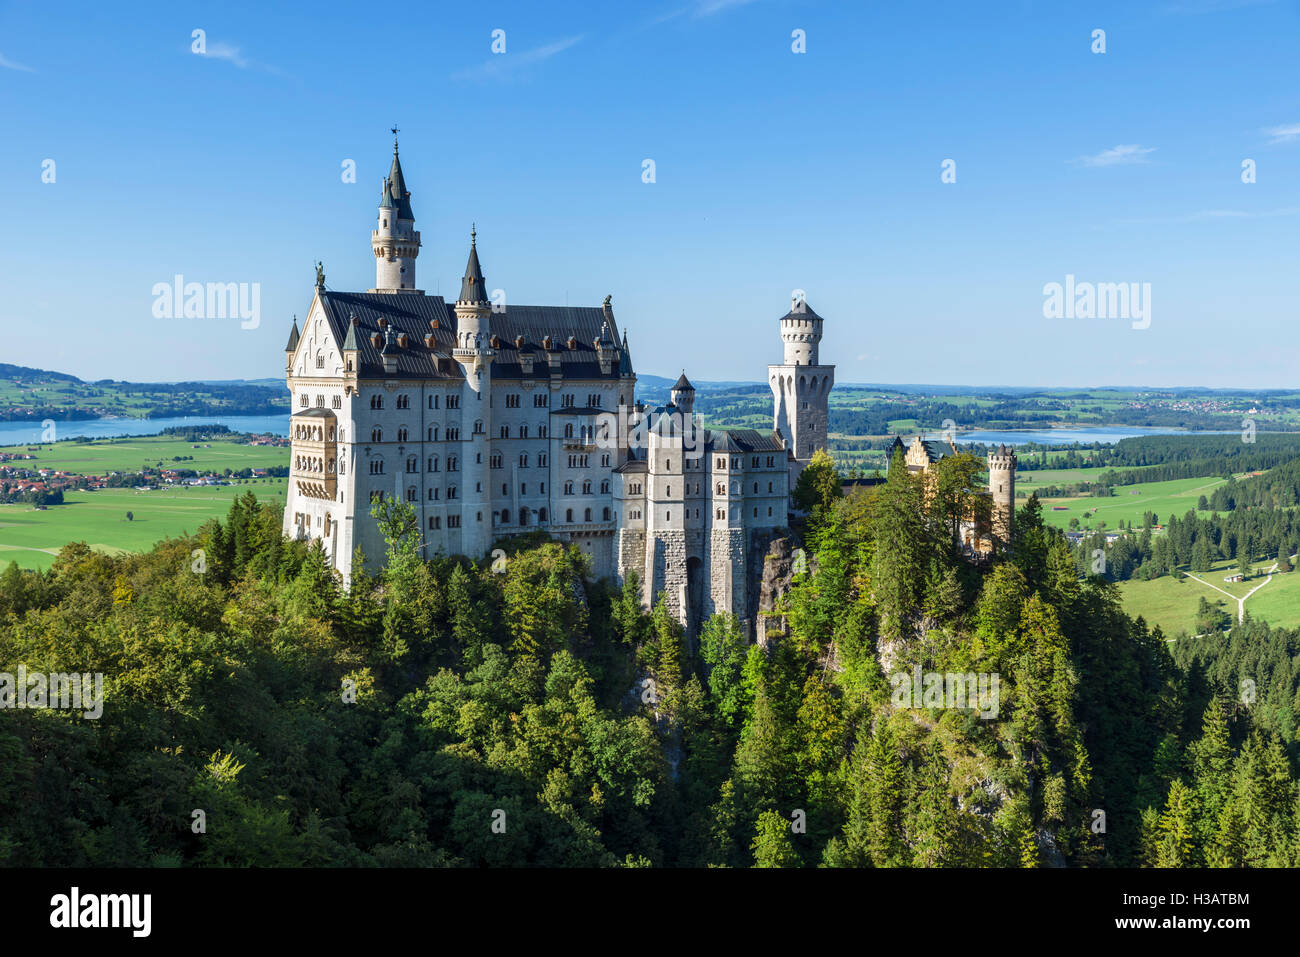 Schloss Neuschwanstein (Schloss Neuschwanstein), die märchenhaften Palast, erbaut von König Ludwig II. Stockbild